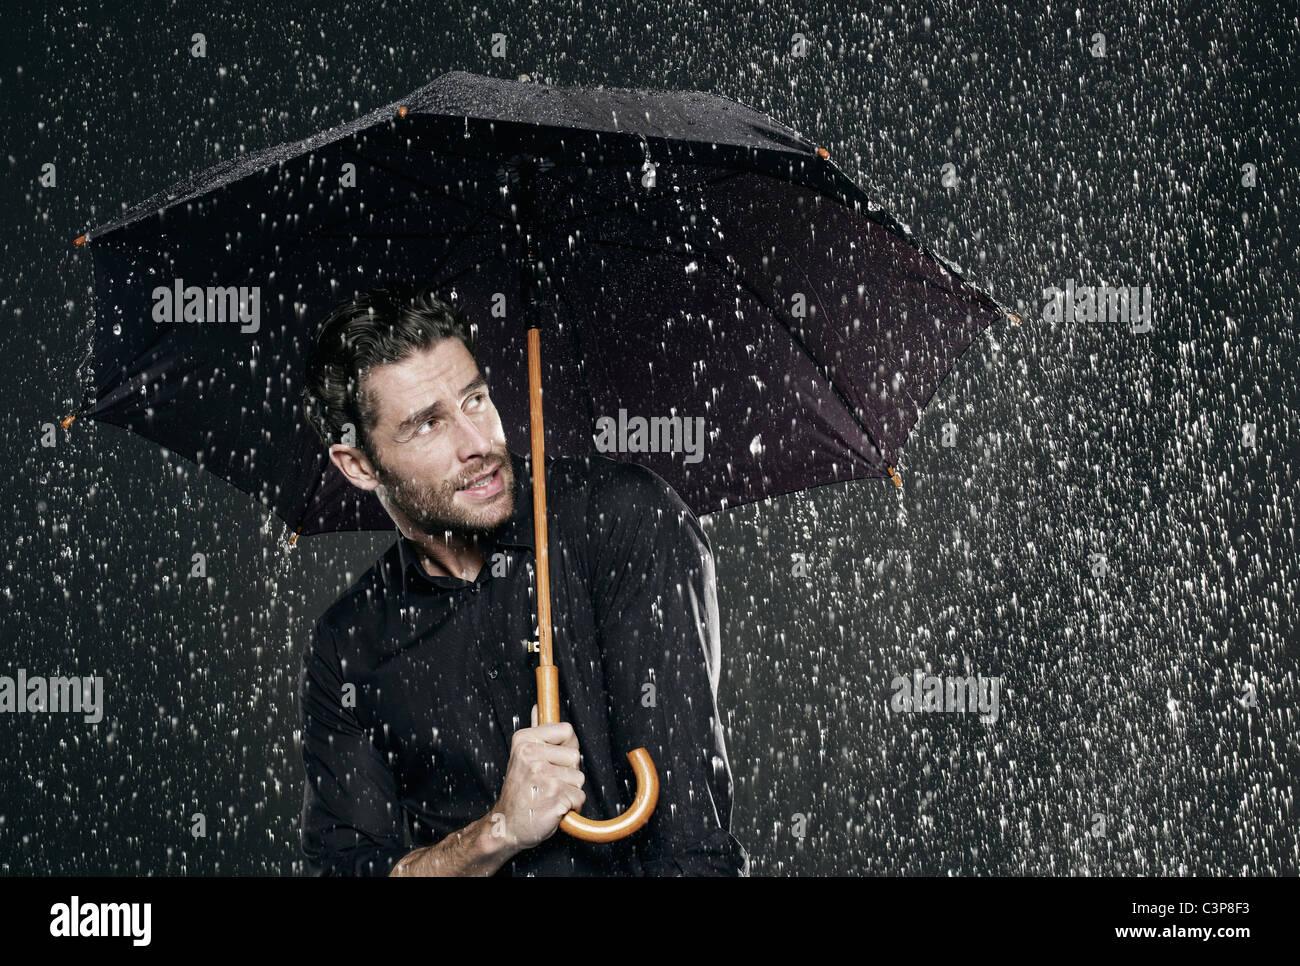 man holding umbrella in rain looking away stock photo 36754343 alamy